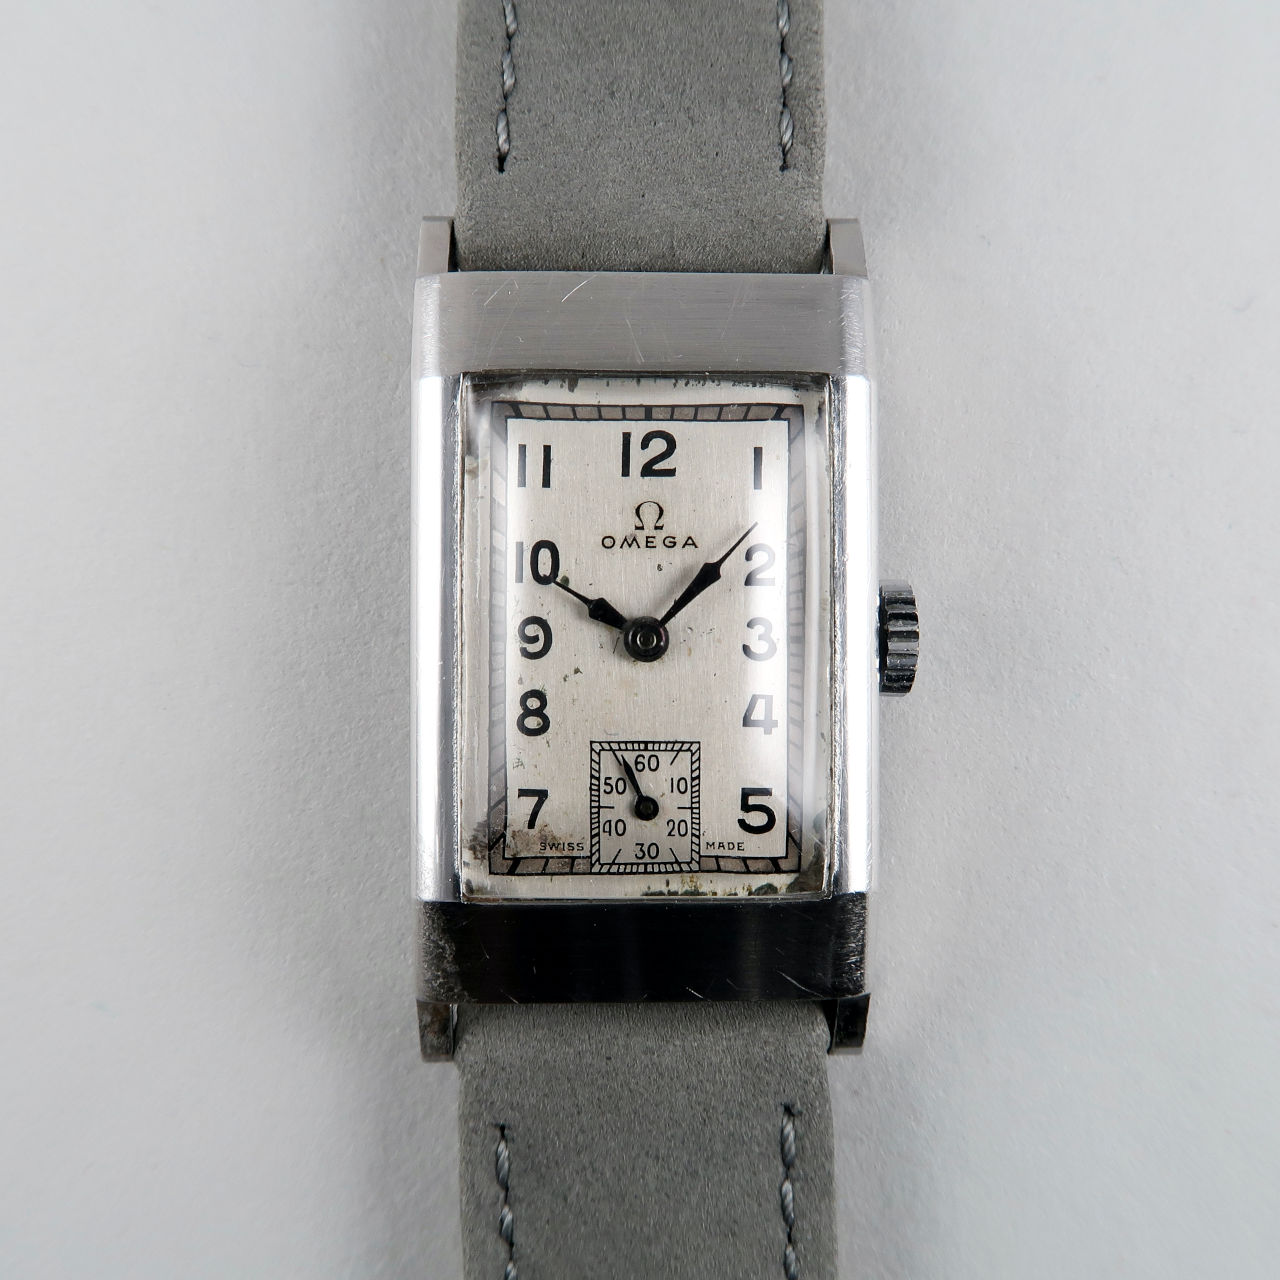 Omega Cal. T17 circa 1940 | steel hand wound rectangular wristwatch